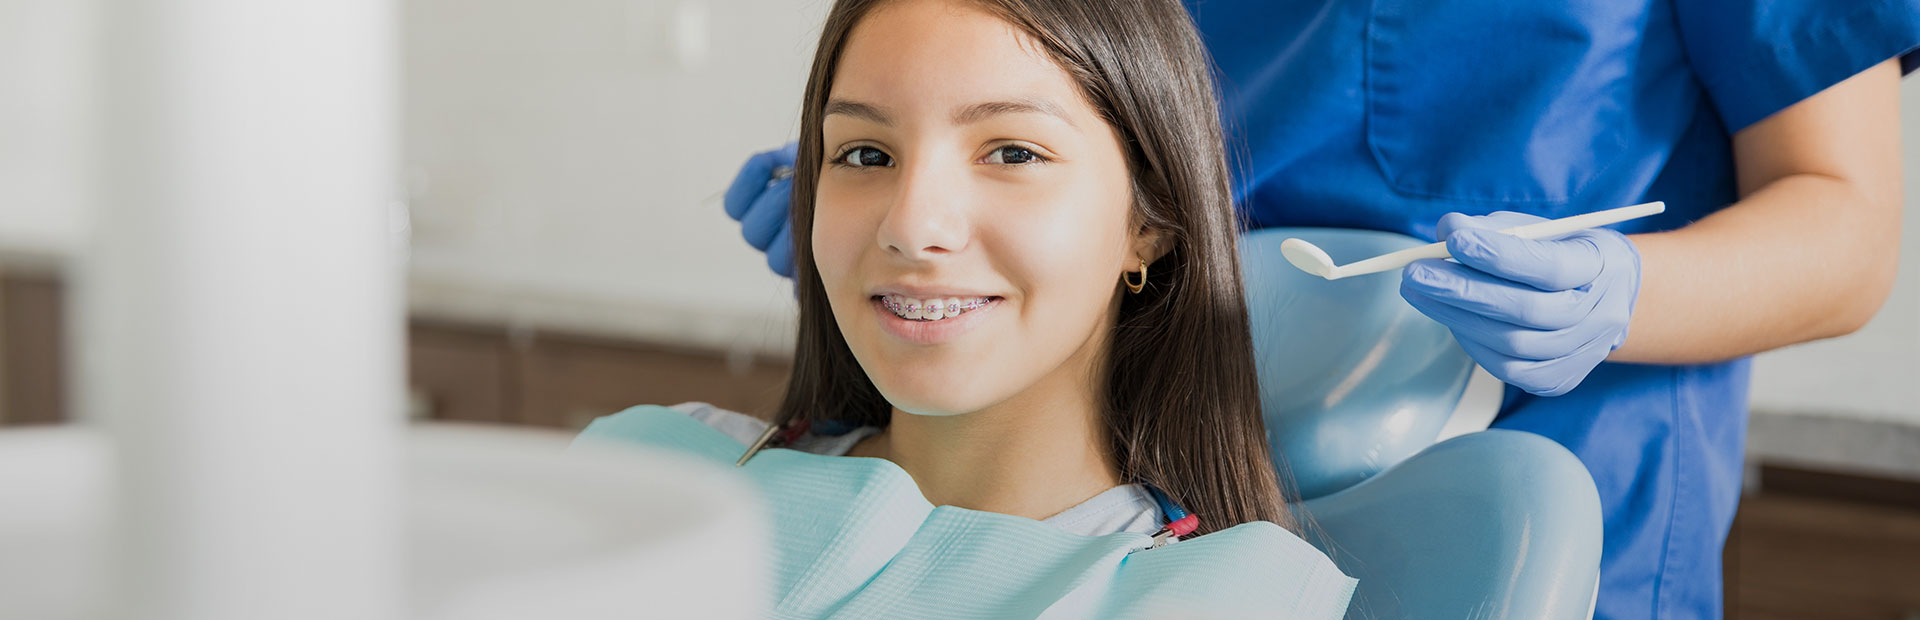 Girl smiling at the dental